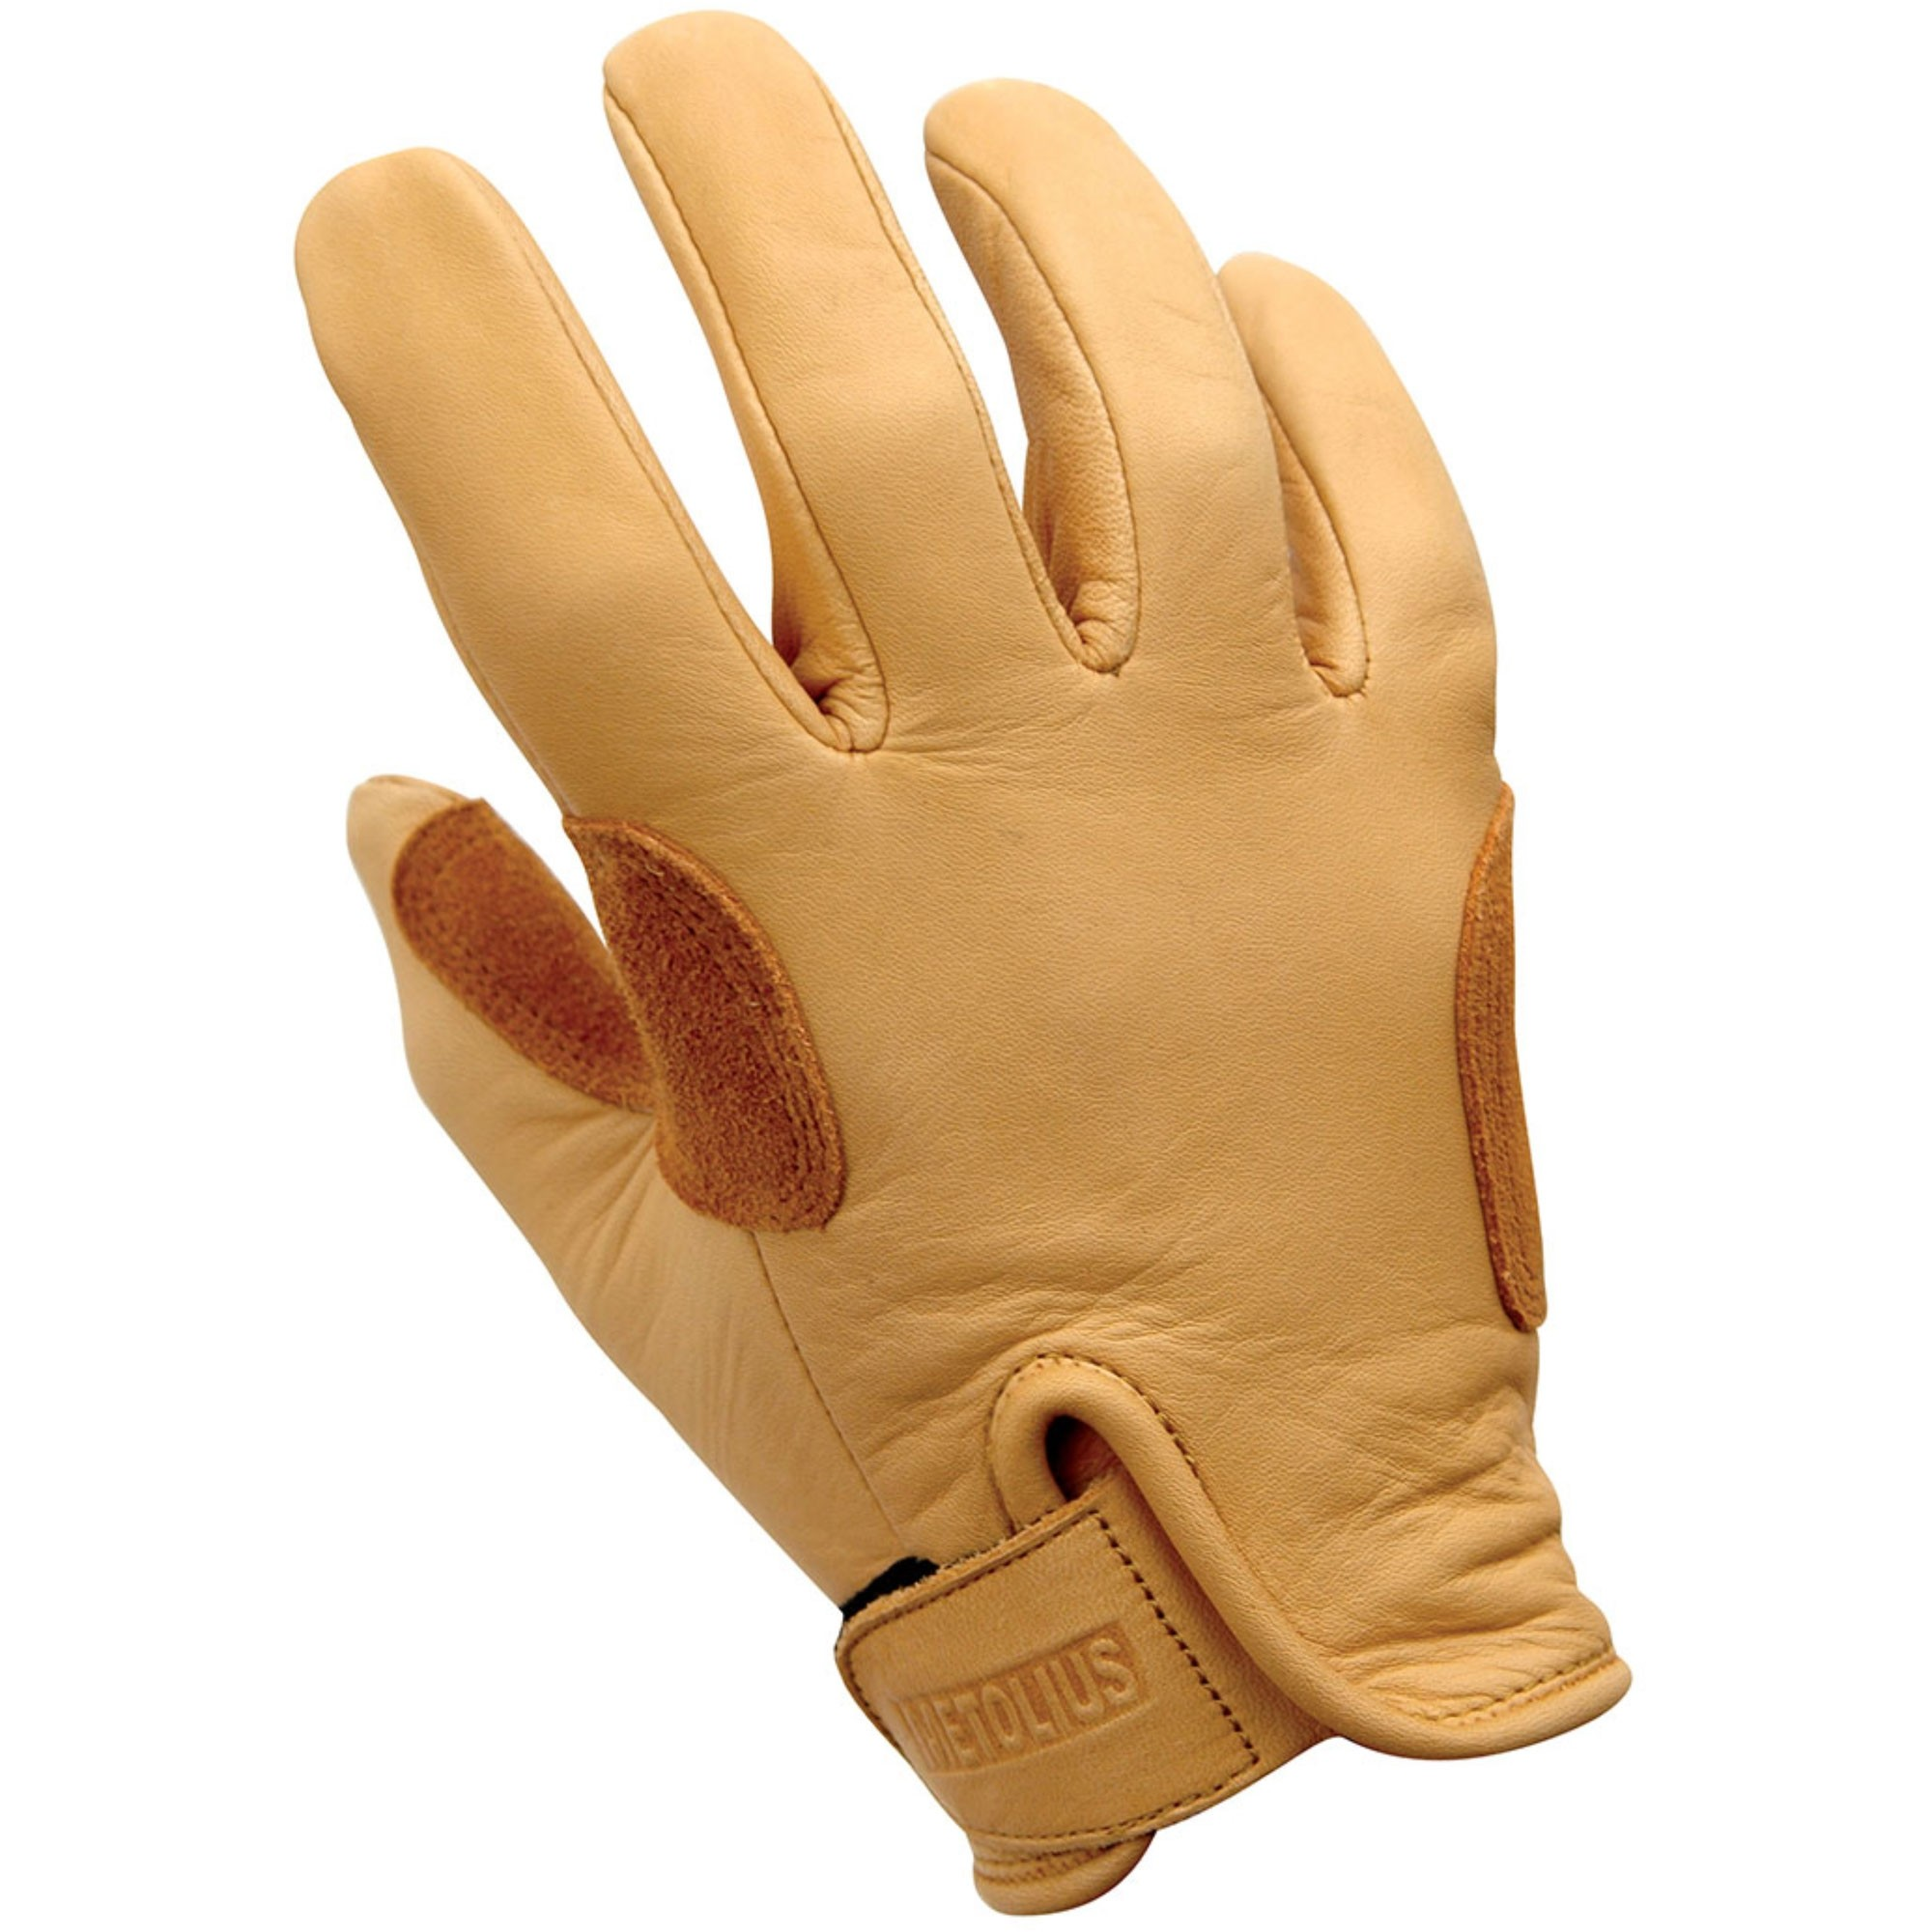 Metolius Belay Glove - Natural/Brown